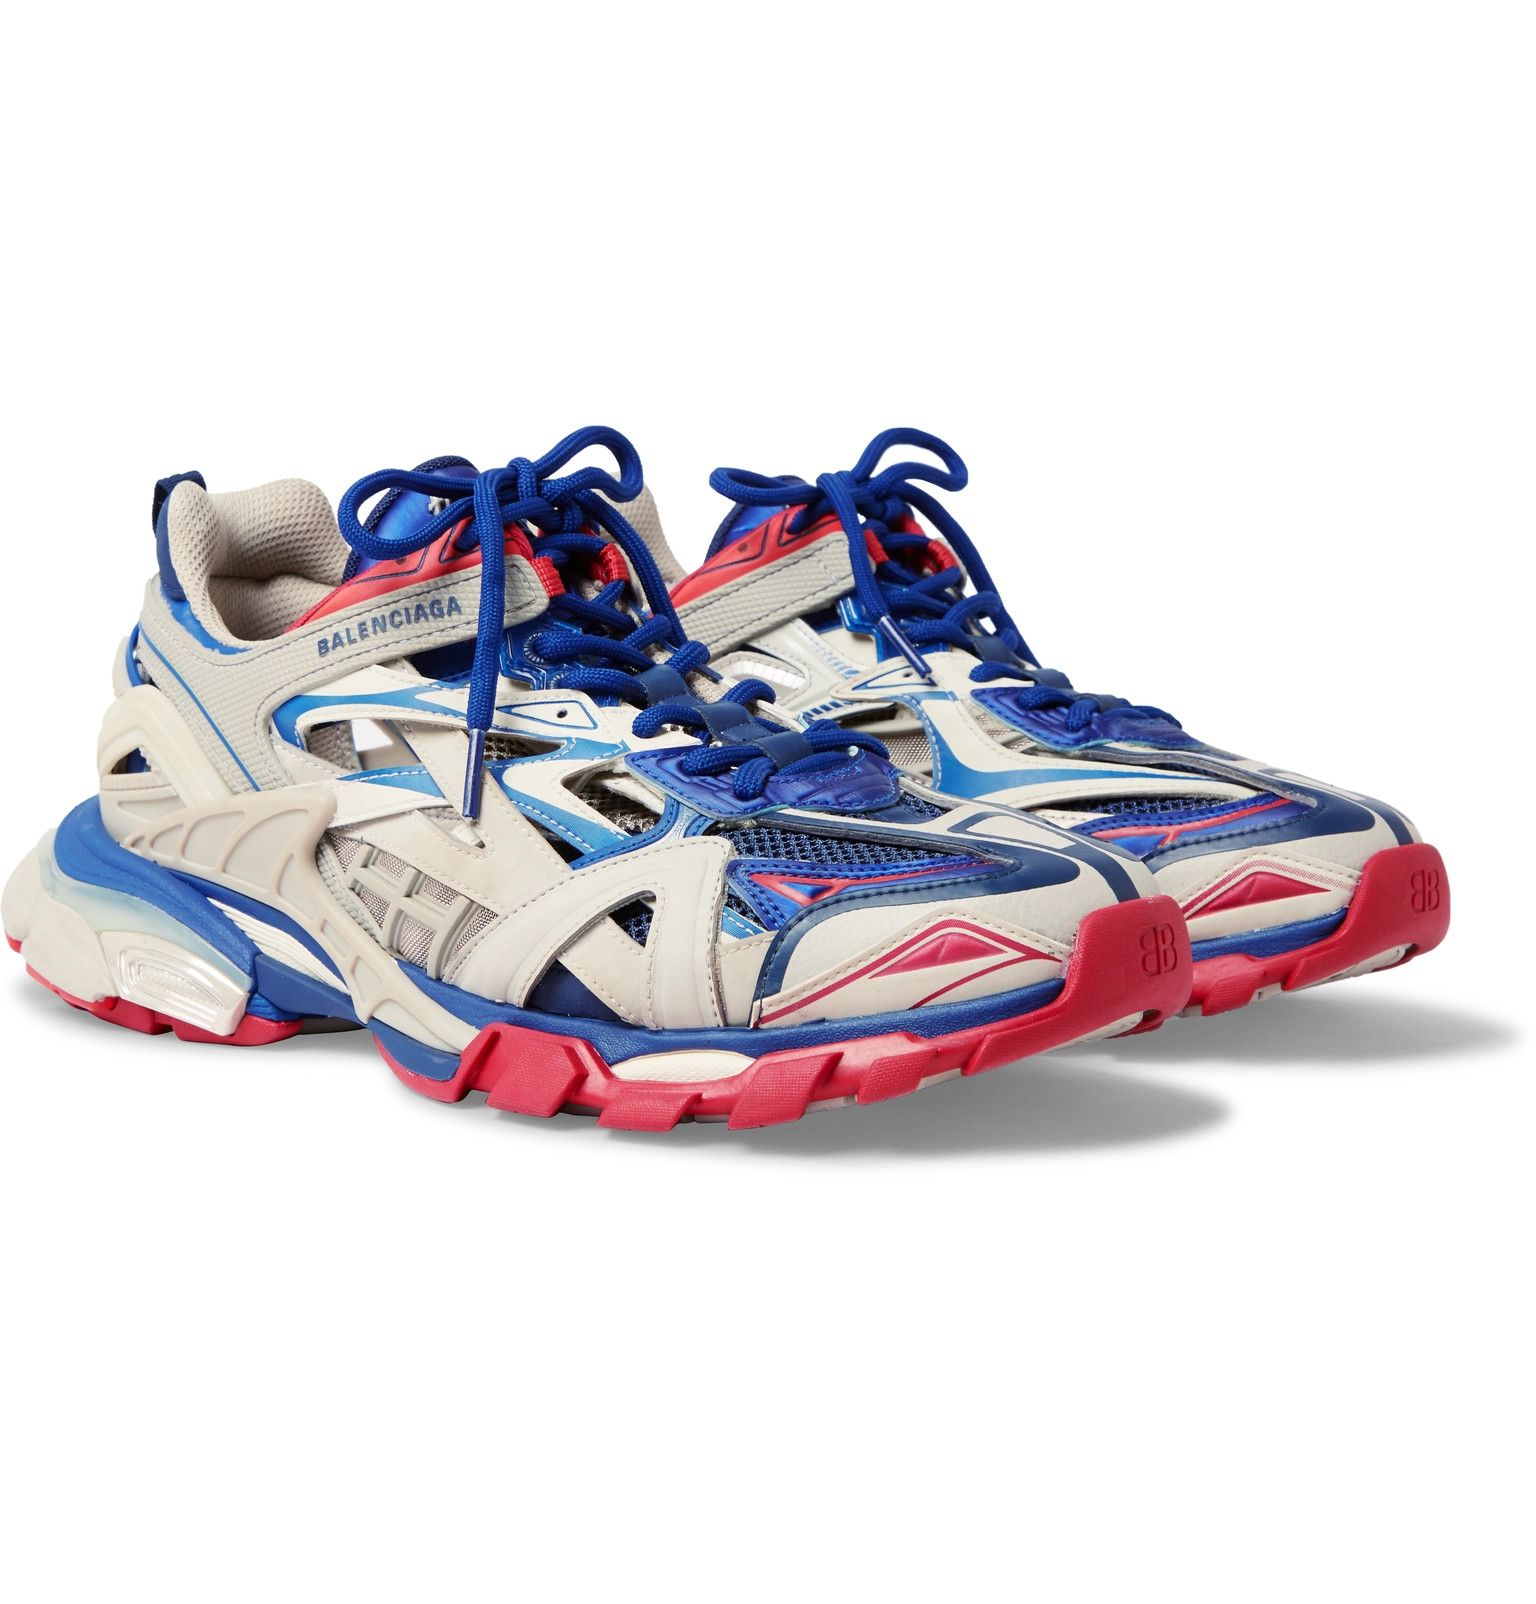 BALENCiAGA TRACK 2 Sneaker Trainer Black Eu 44 Uk 10